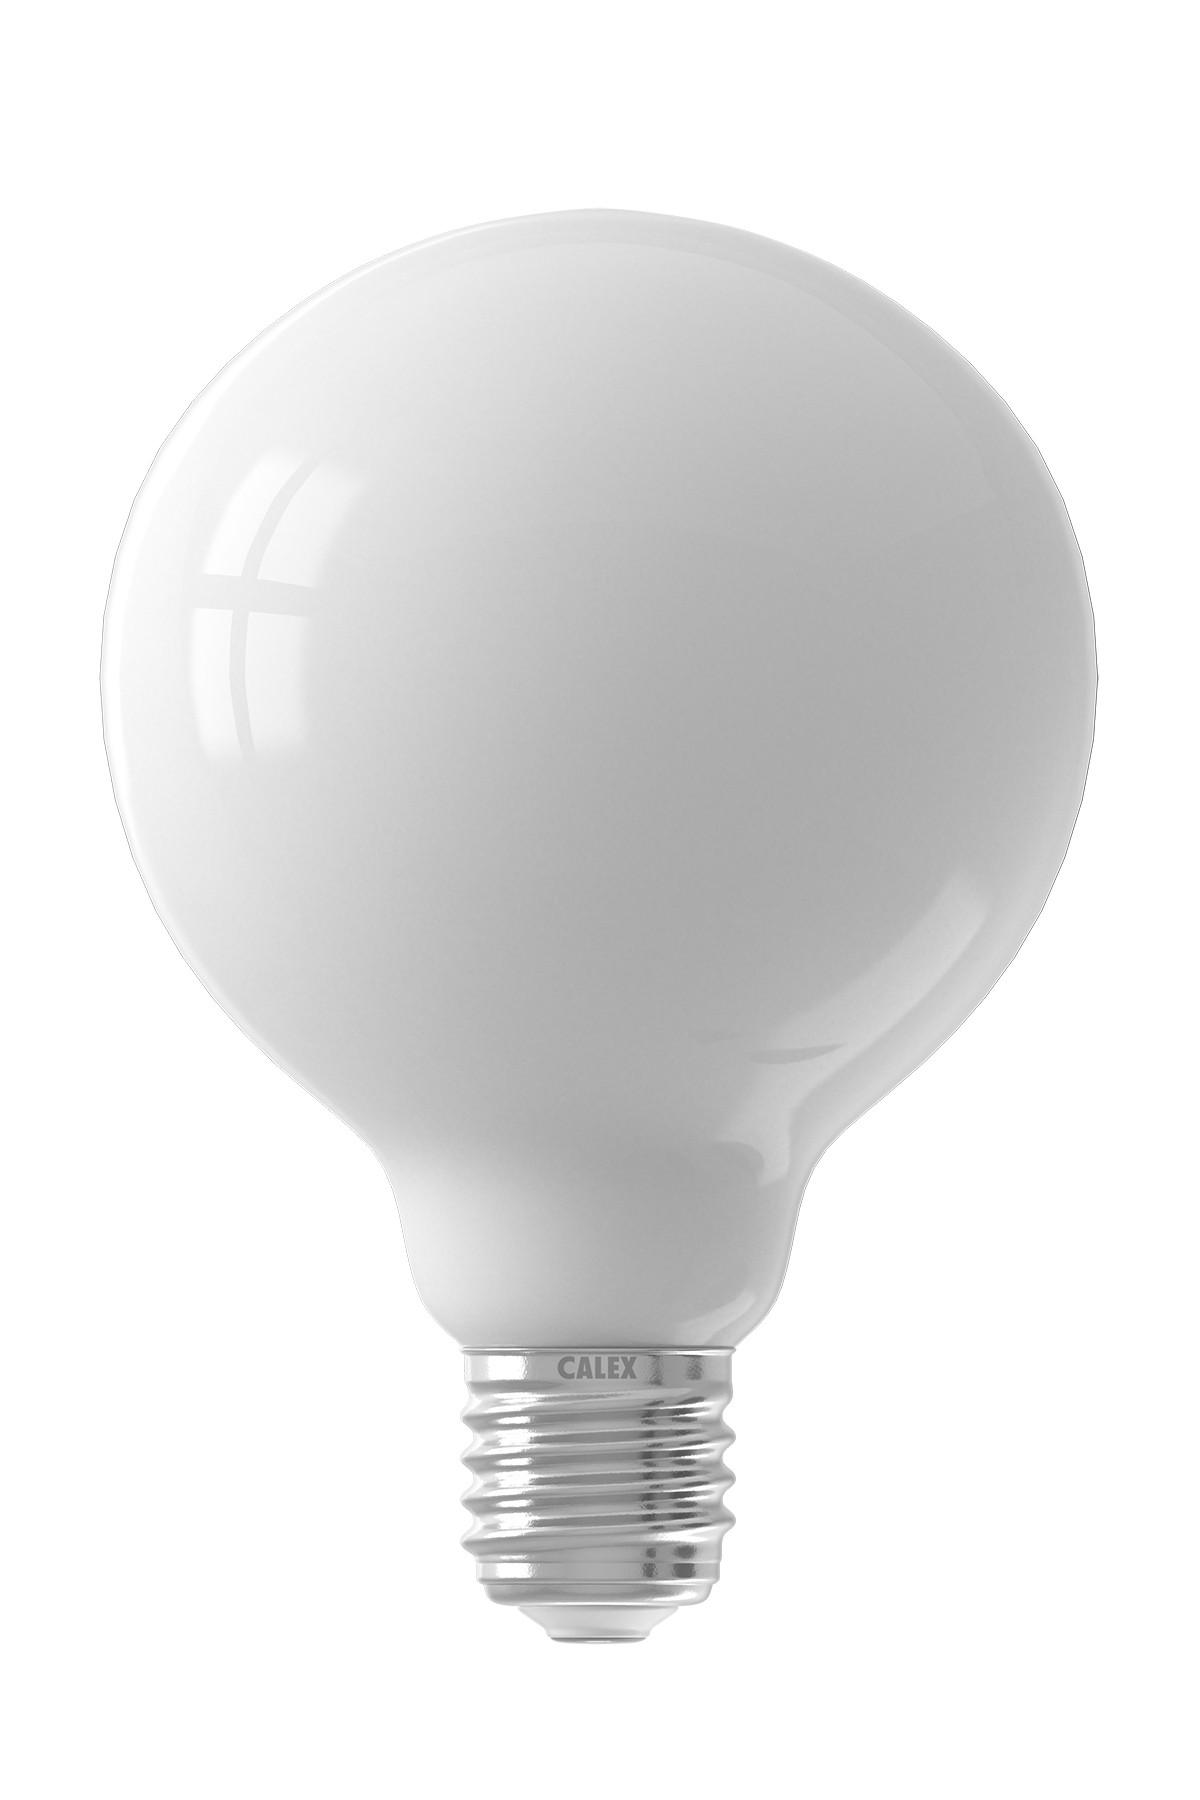 Filament LED Dimbare Globe Lamp 240V 8W E27